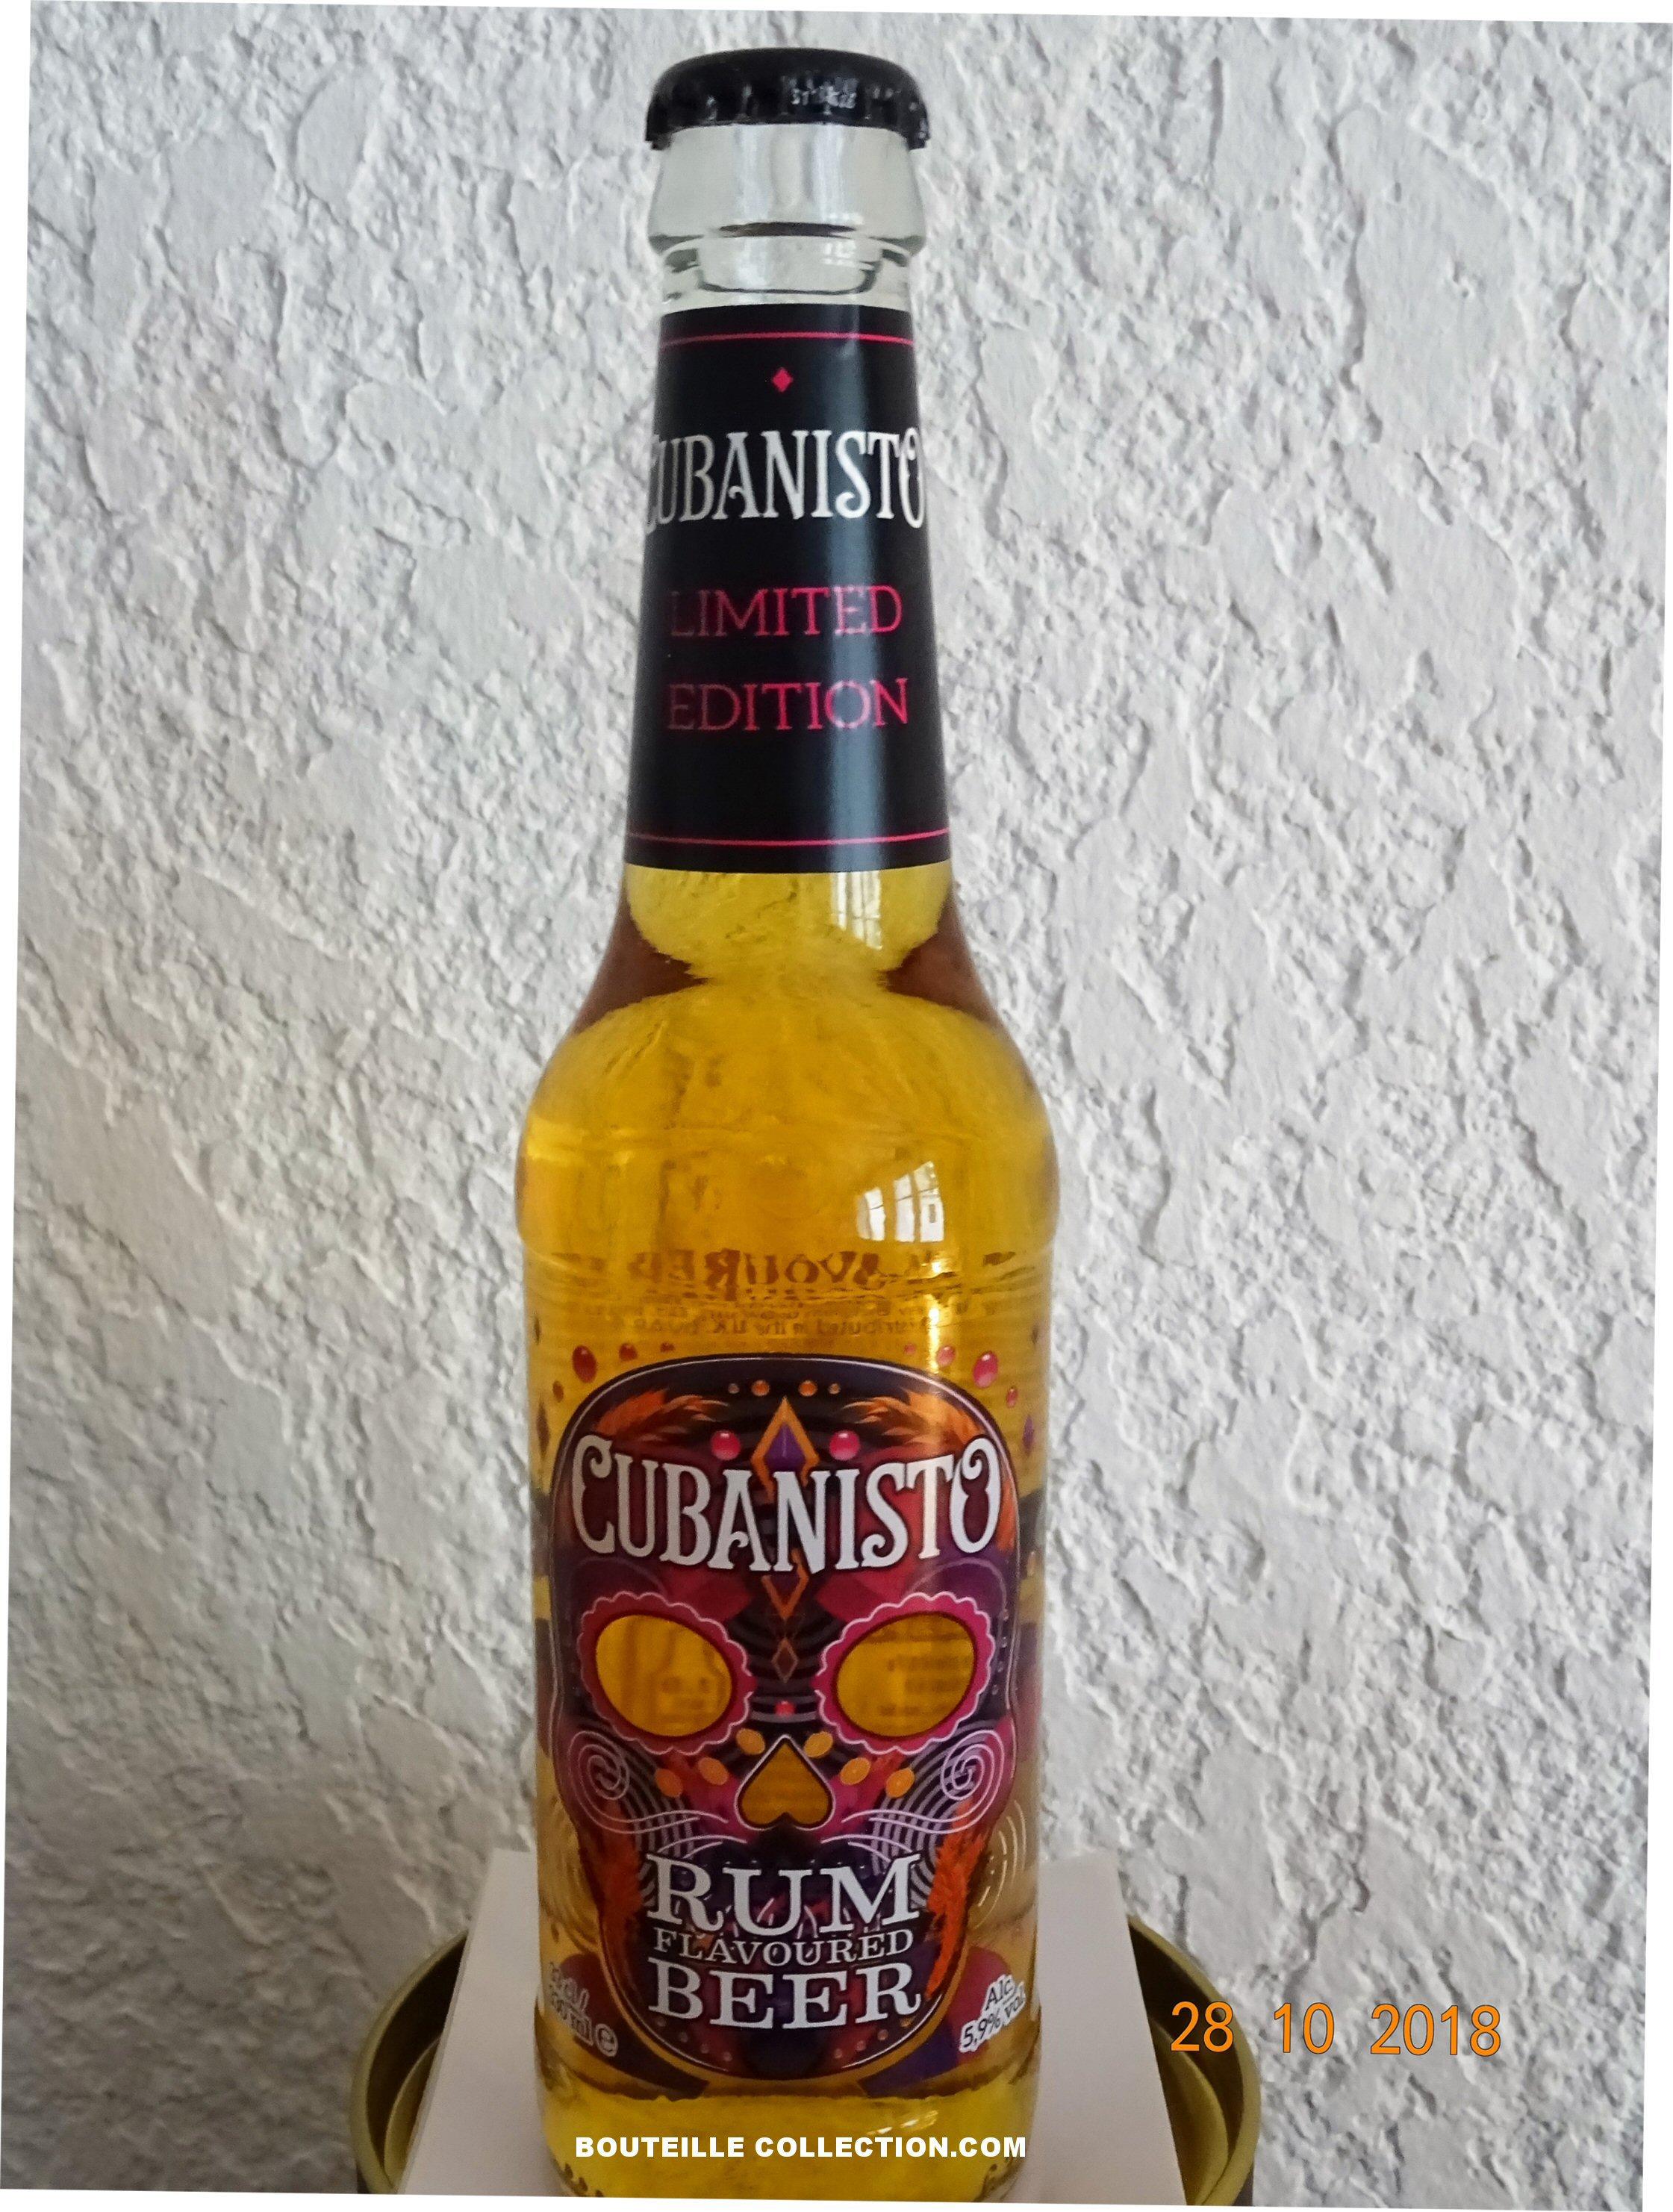 CUBANISTO RHUM BEER 2018 33CL E.JPG